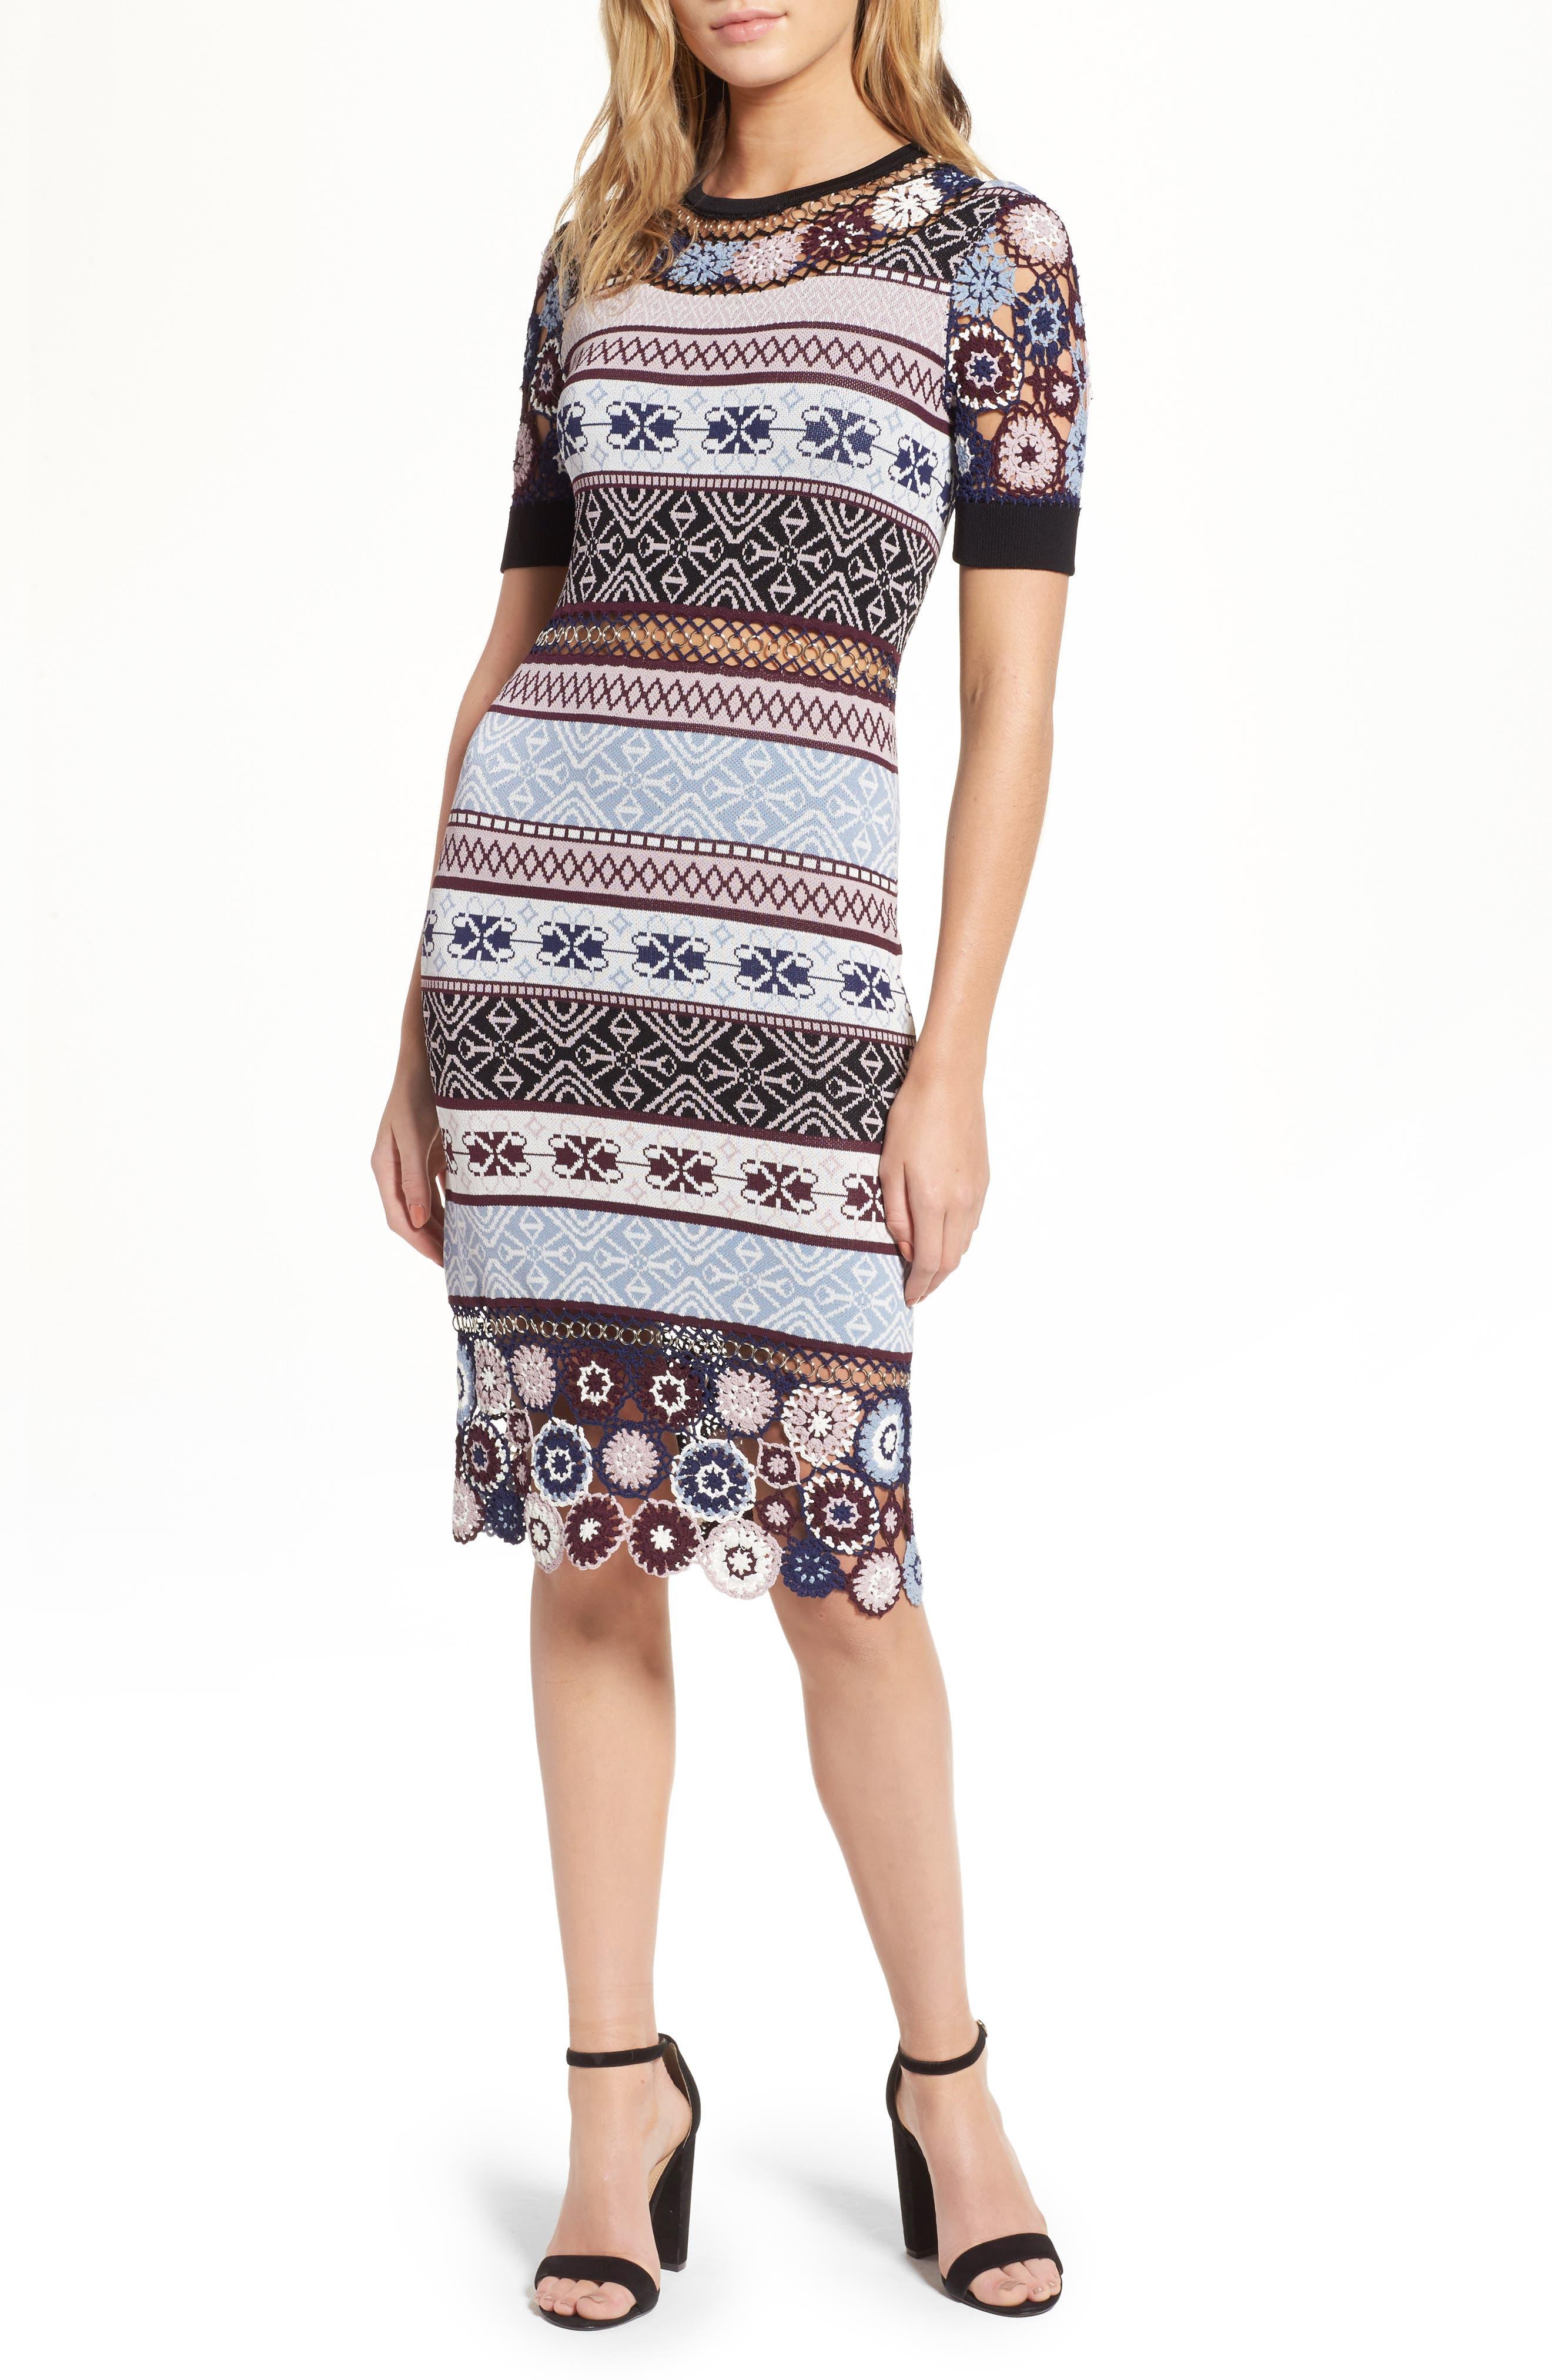 Alternate Image 1 Selected - Parker Carol Crochet Pencil Dress